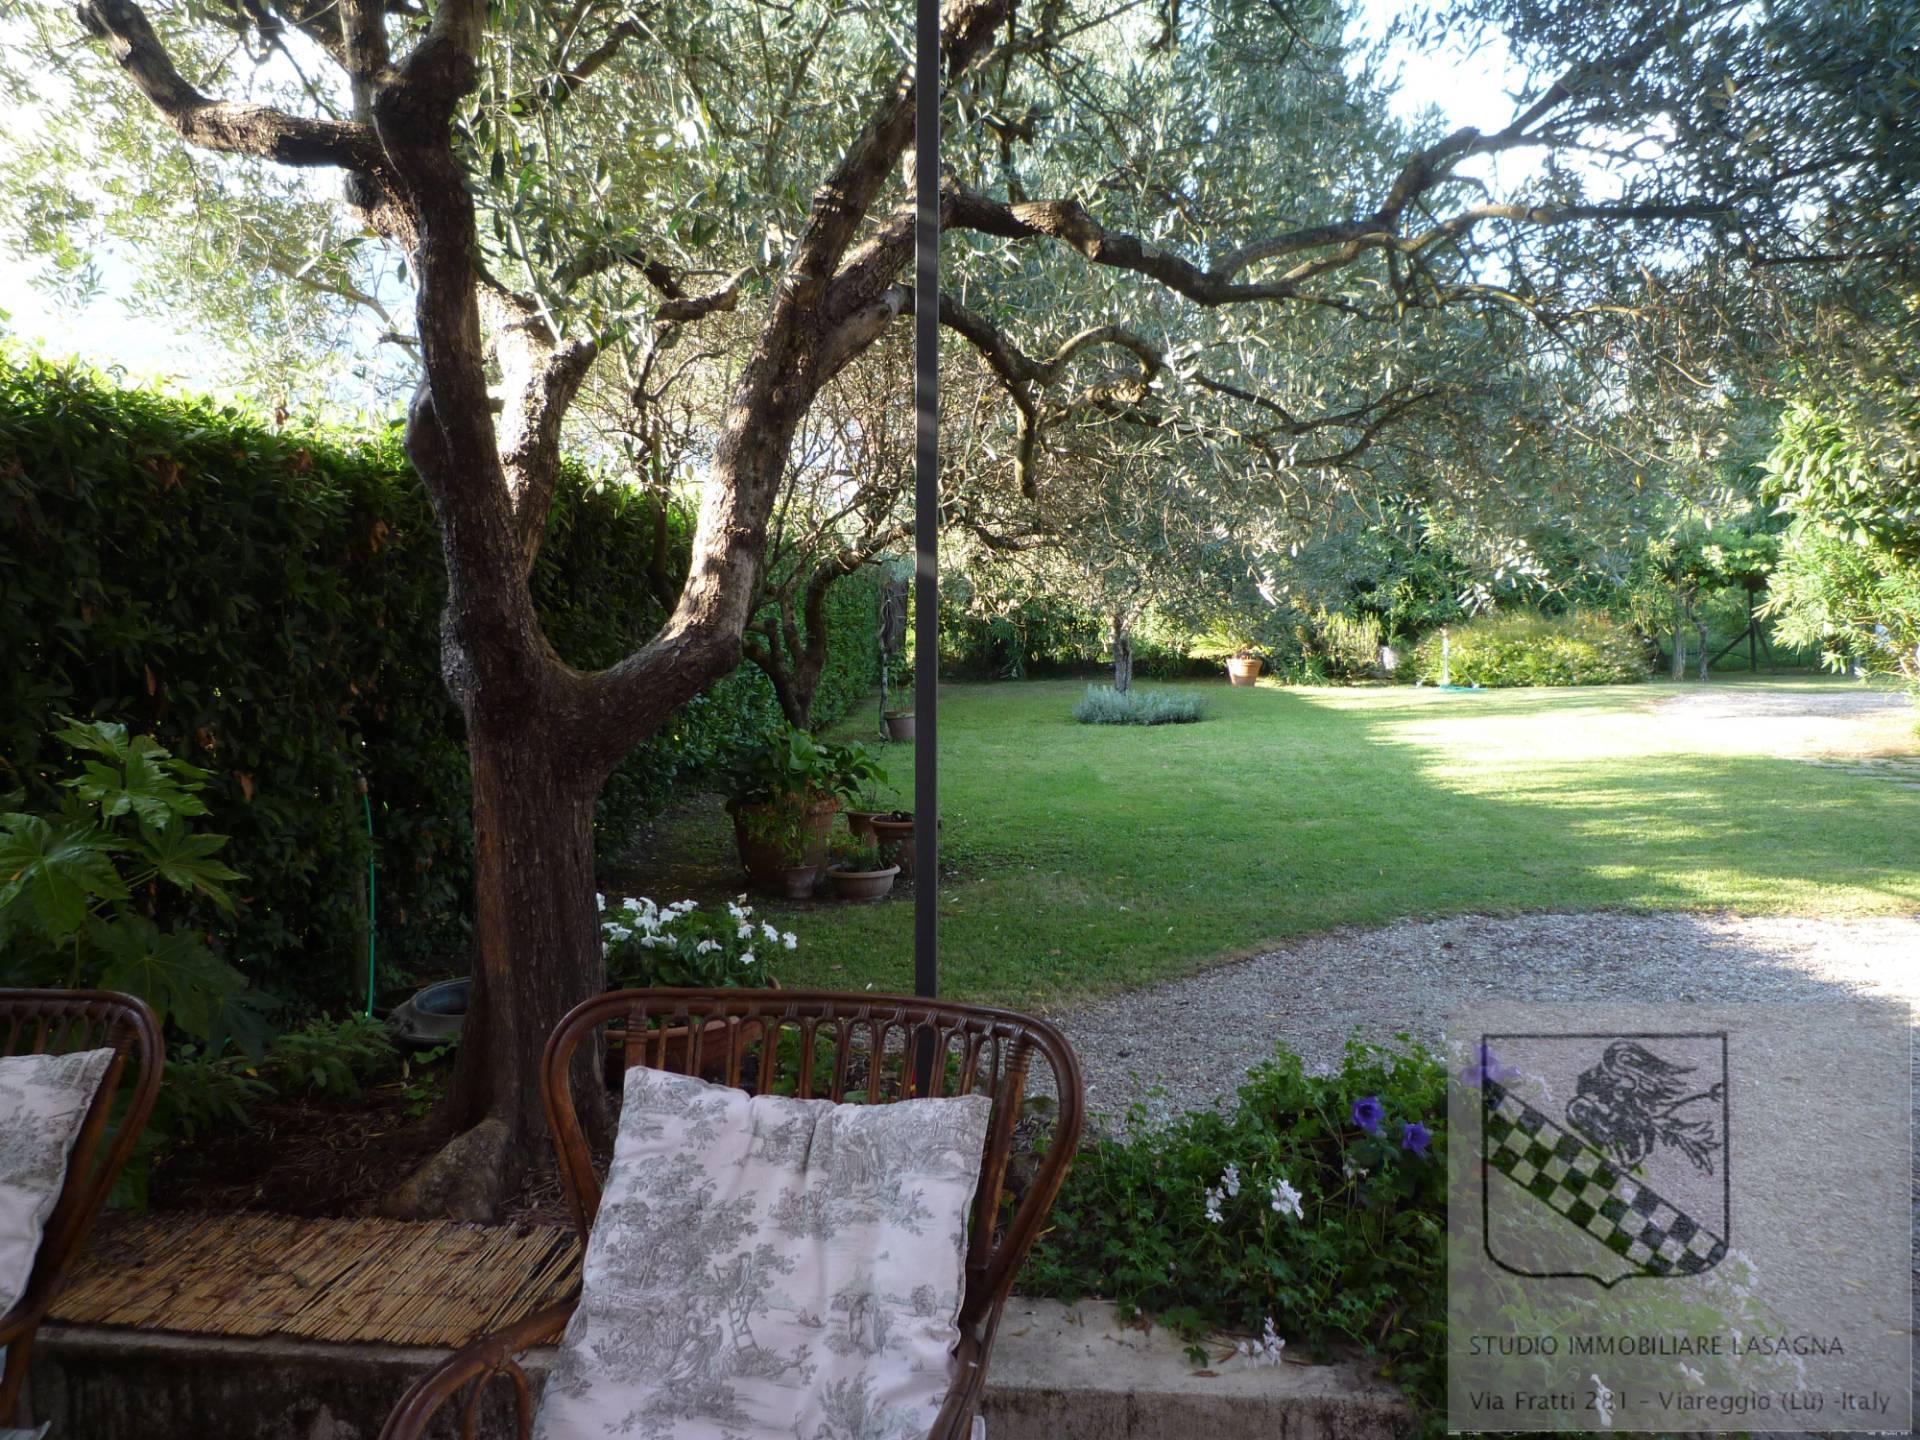 Villa in Vendita a Camaiore: 5 locali, 120 mq - Foto 9